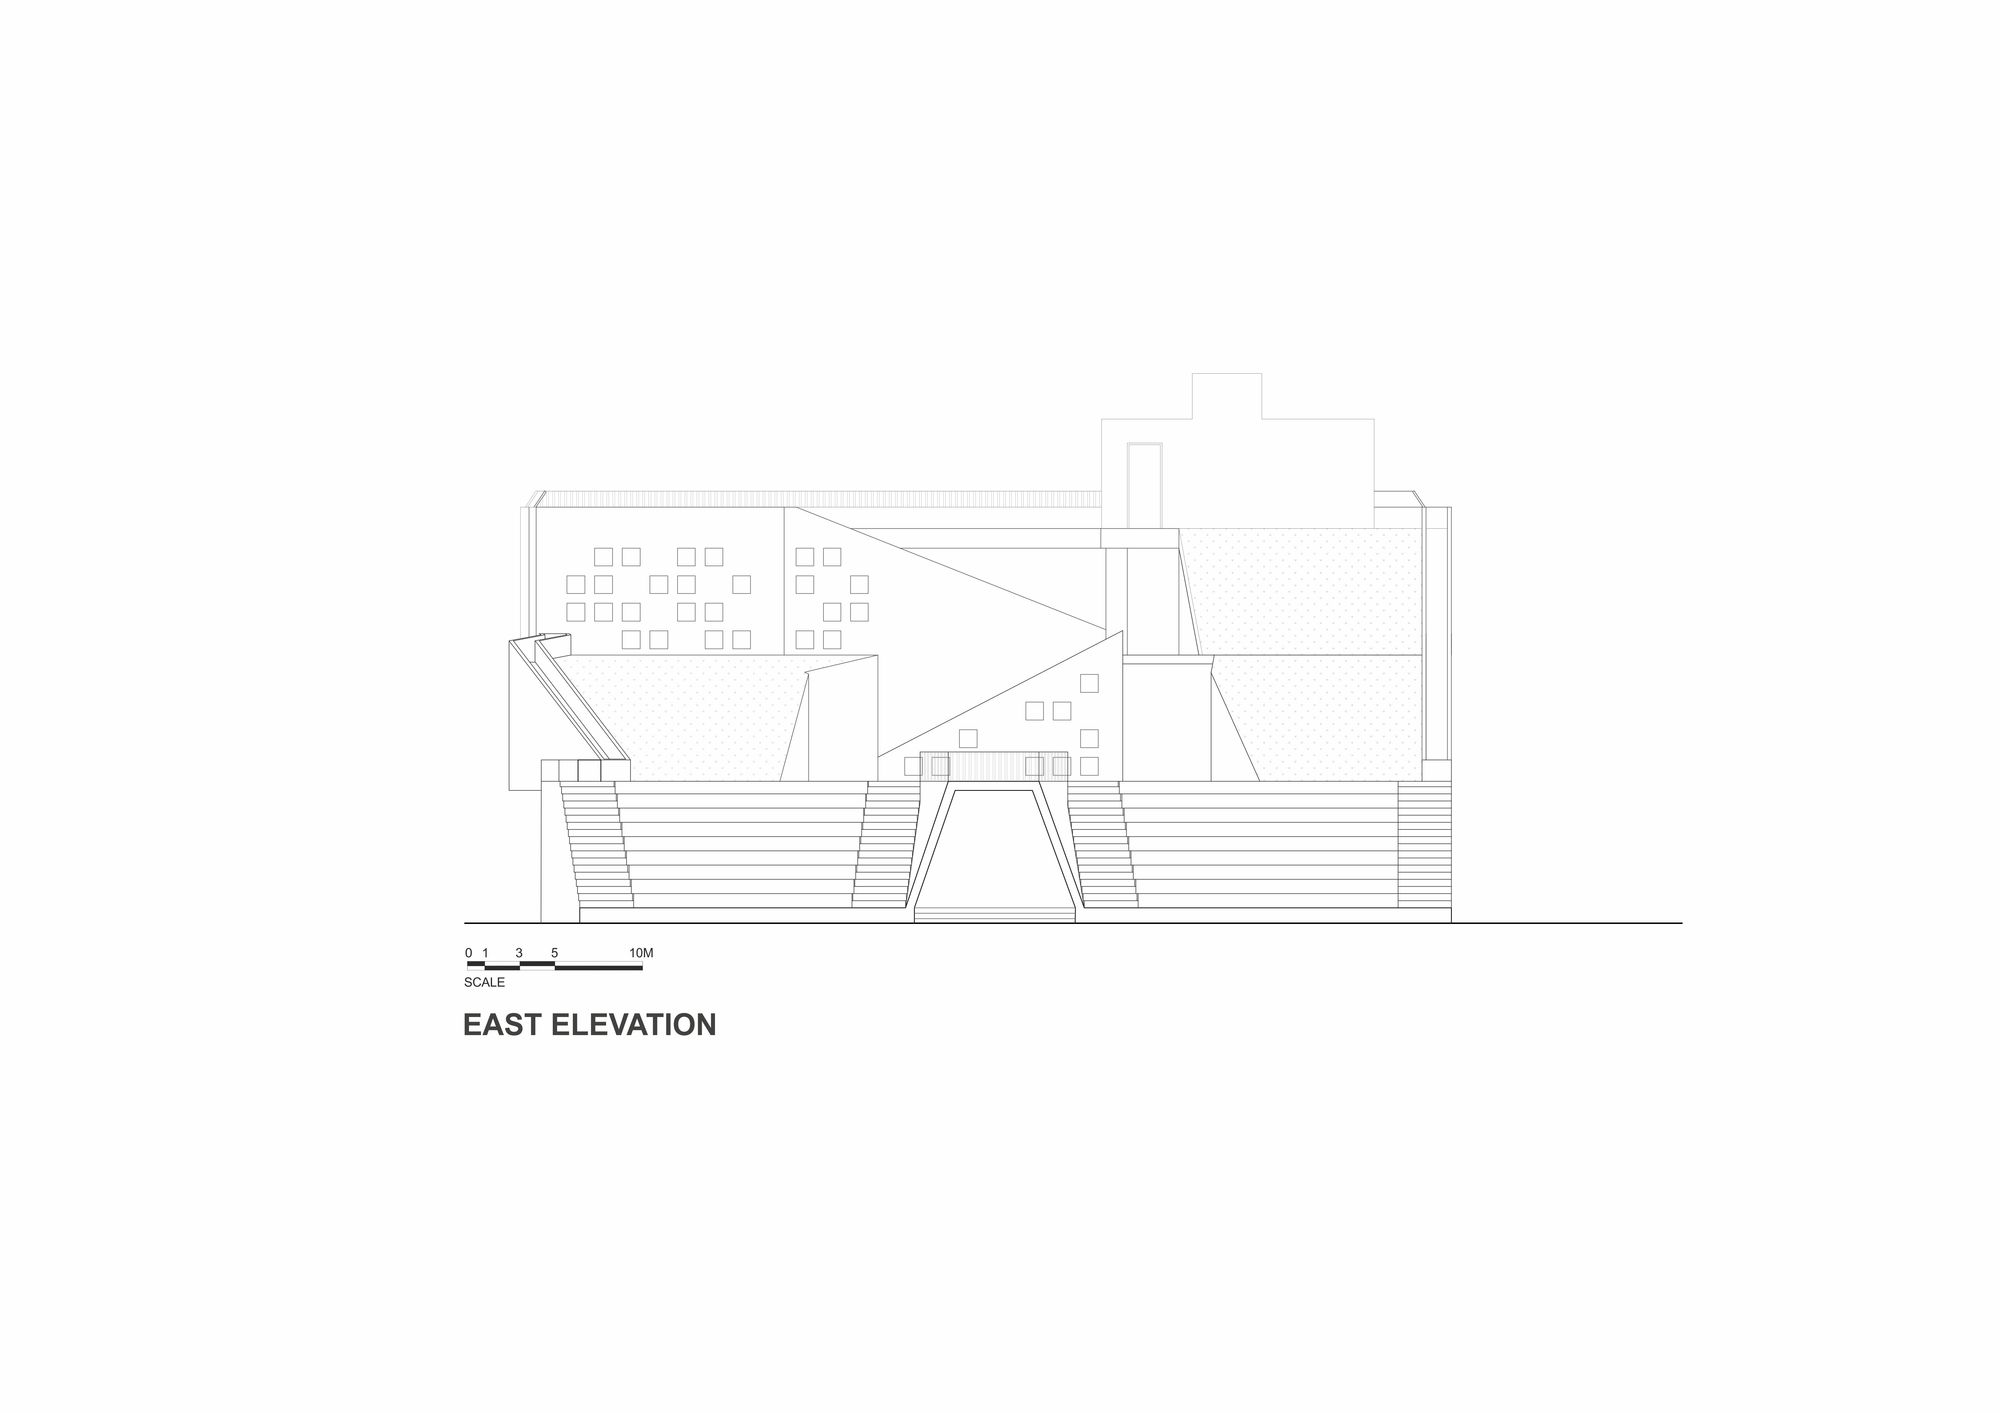 m5 _SANGAM_ELEMENTARY_SCHOOL_EAST_ELEVATION.jpg